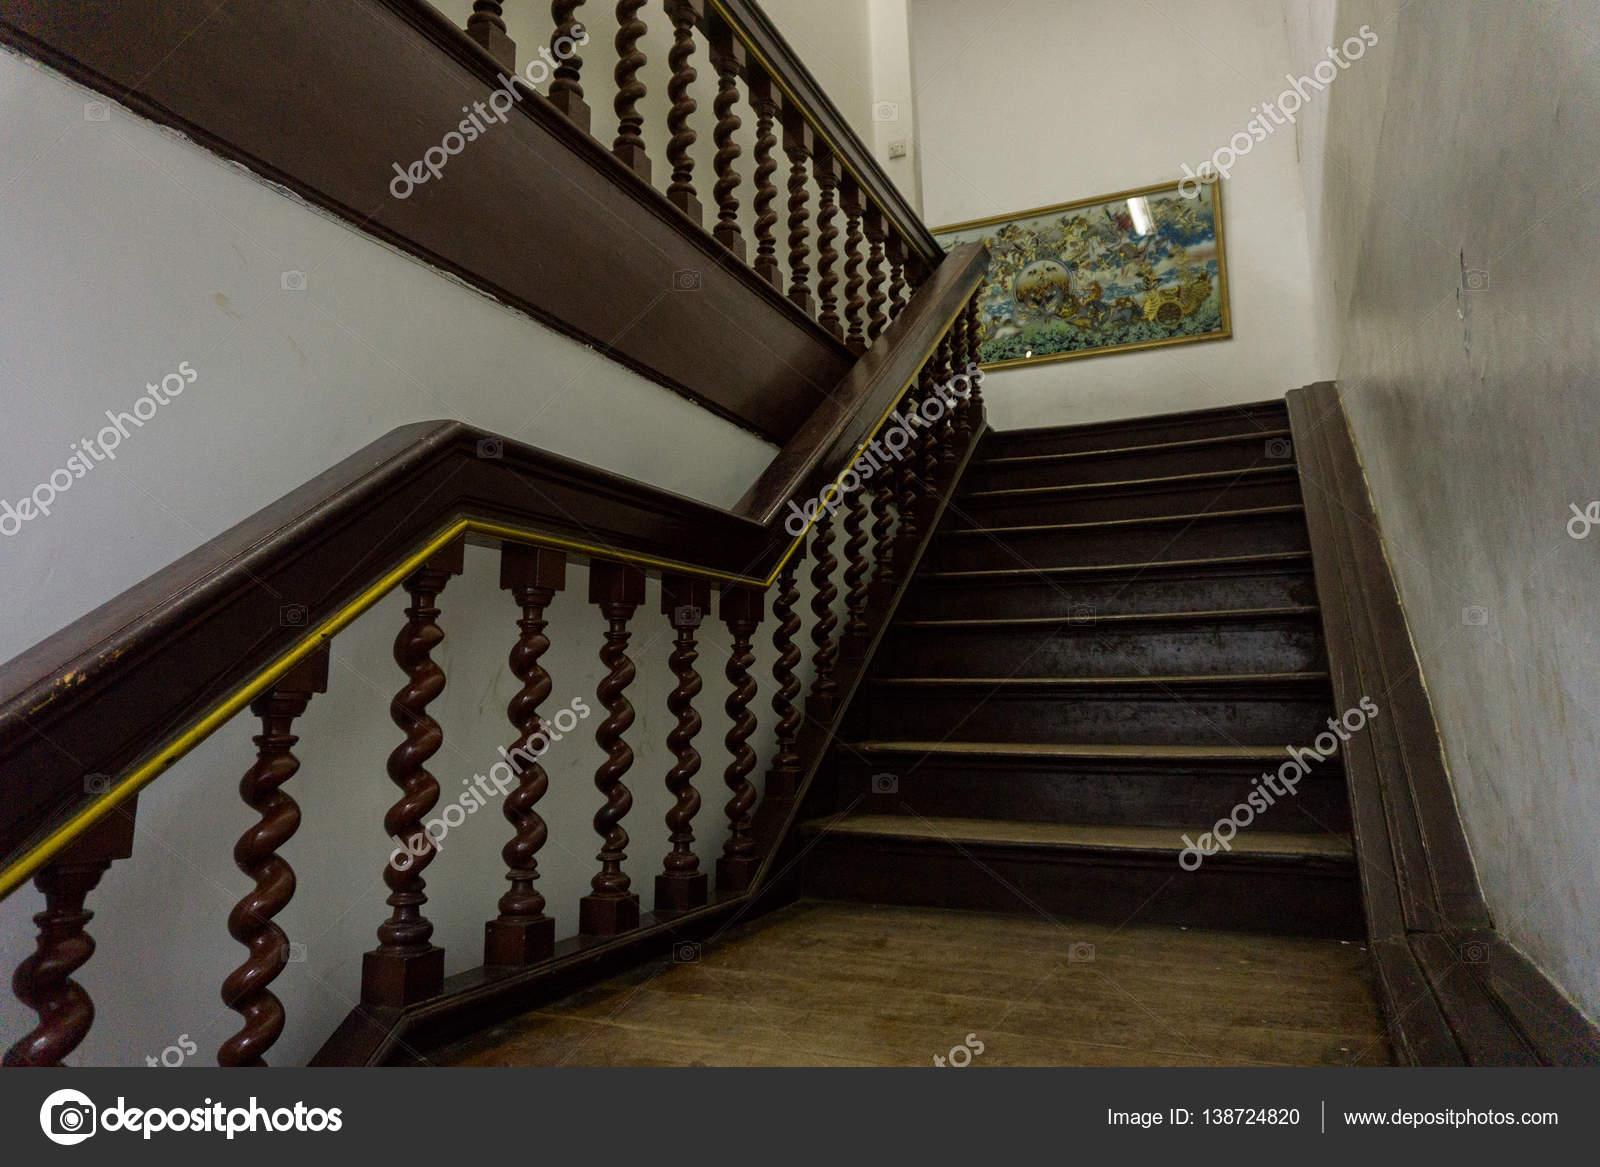 Klassische Treppen eine klassische treppen aus alten holz foto in kota tua jakarta